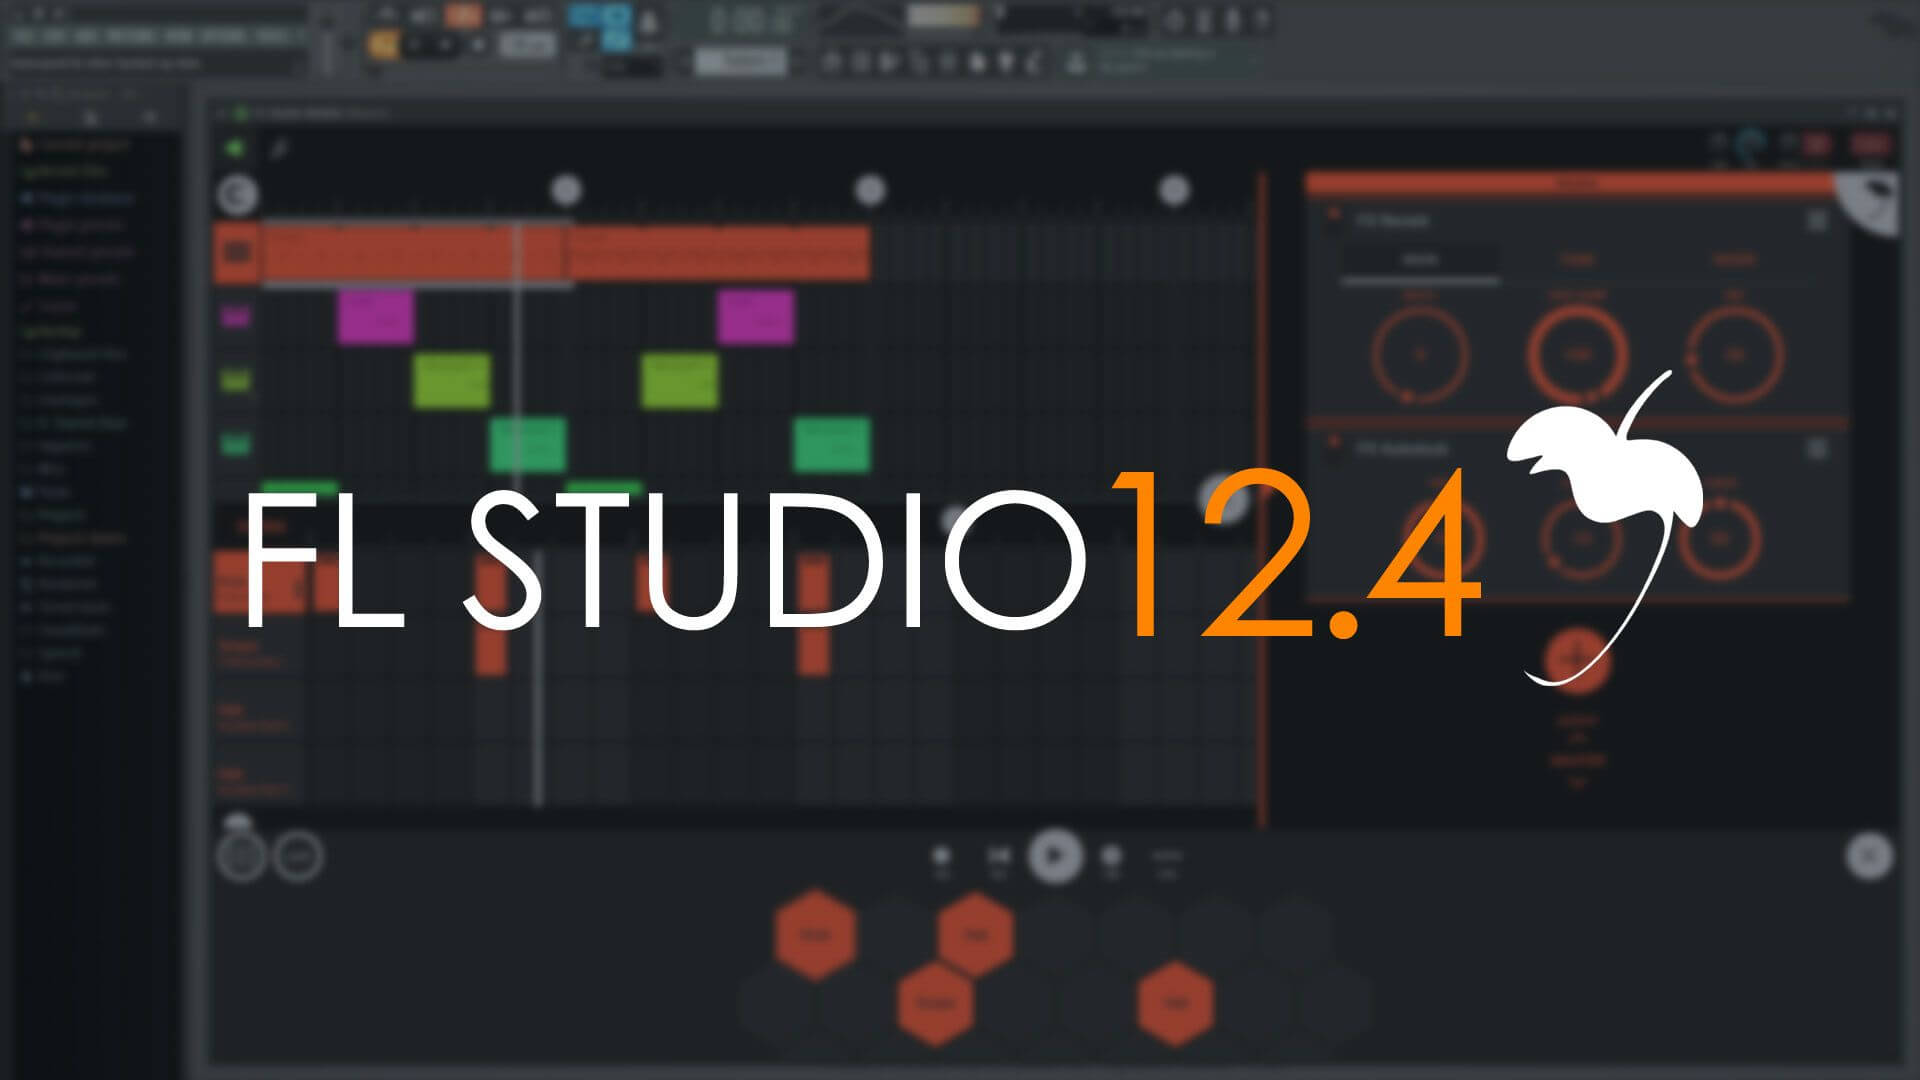 FL Studio Producer Edition 12.4.2 crack